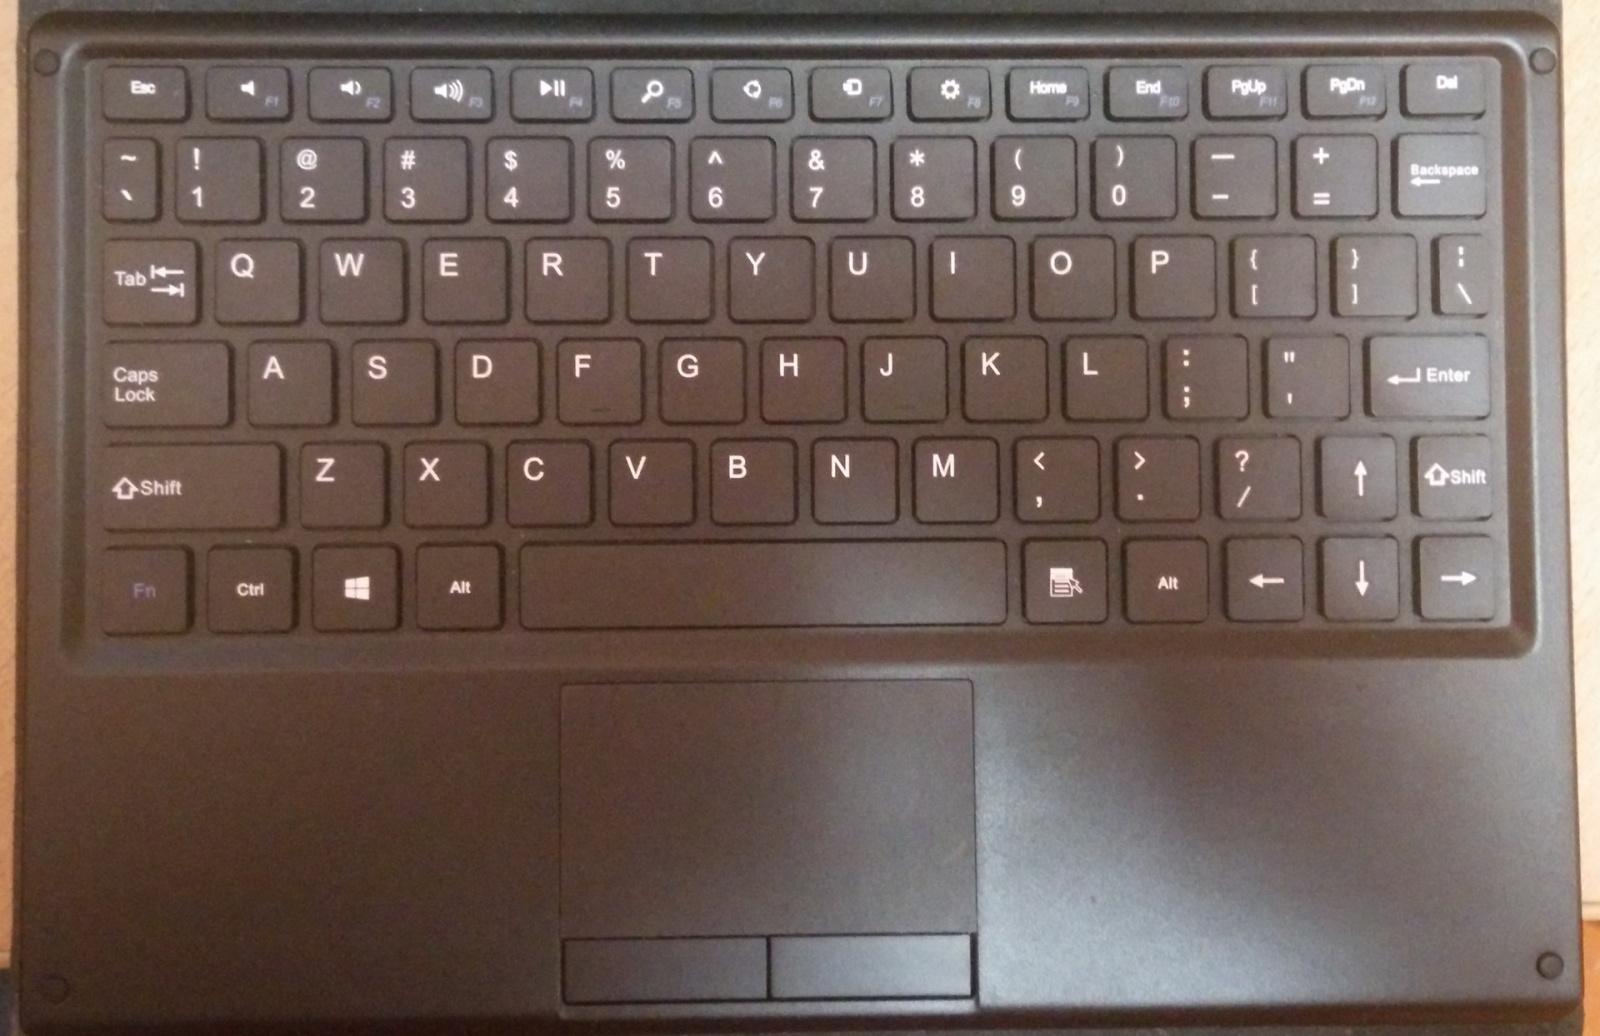 Обзор планшета на Windows 8.1 (Vido w11c) - 5